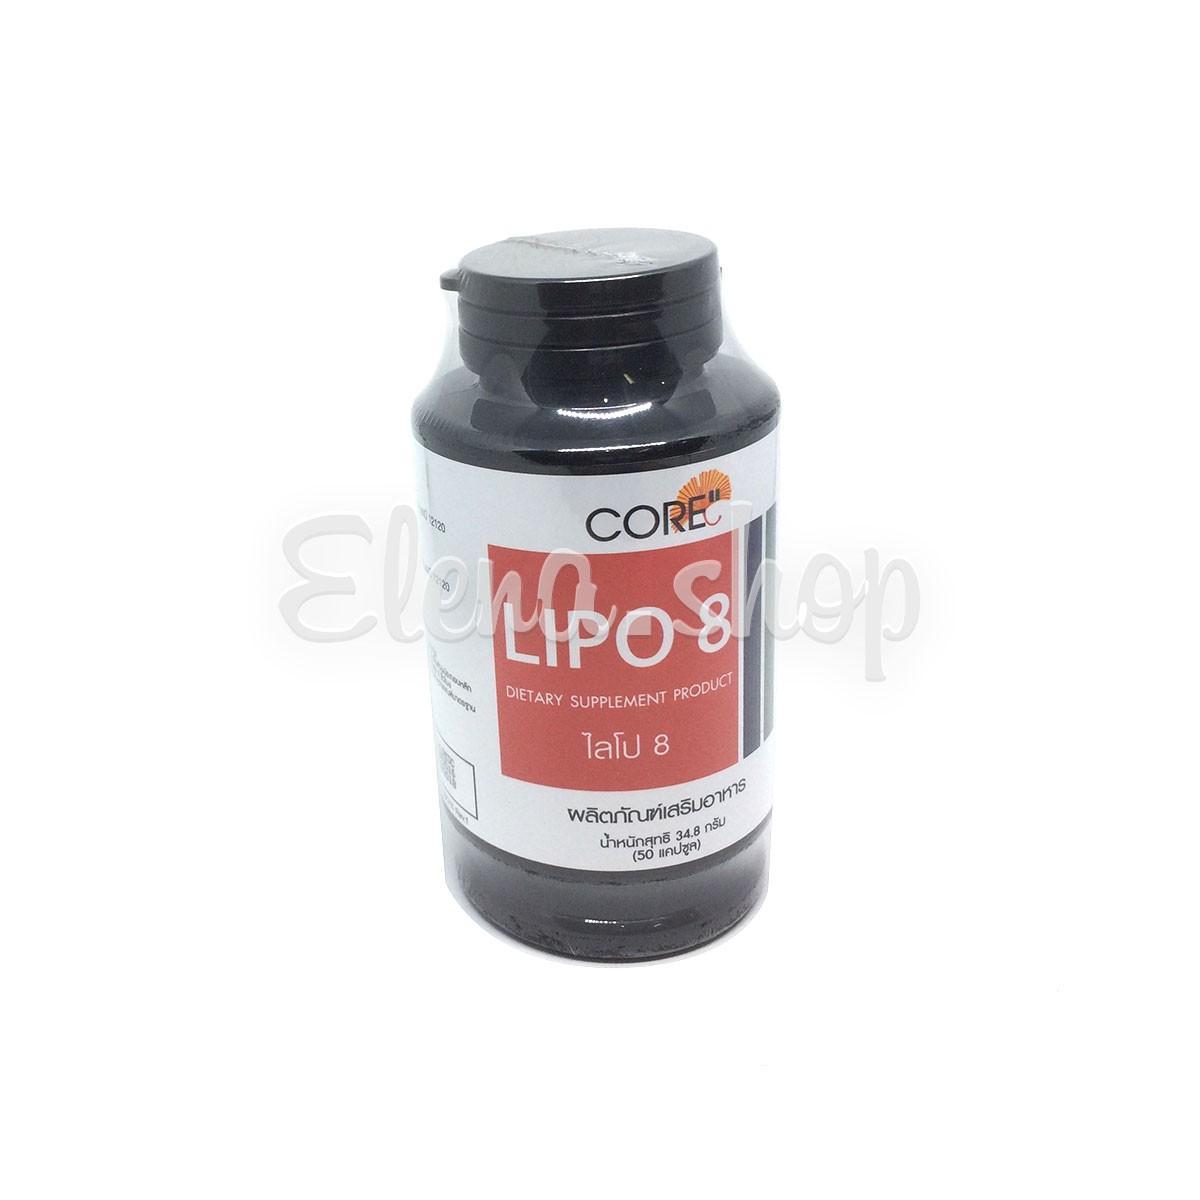 Капсулы для похудения LIPO 8 от Core